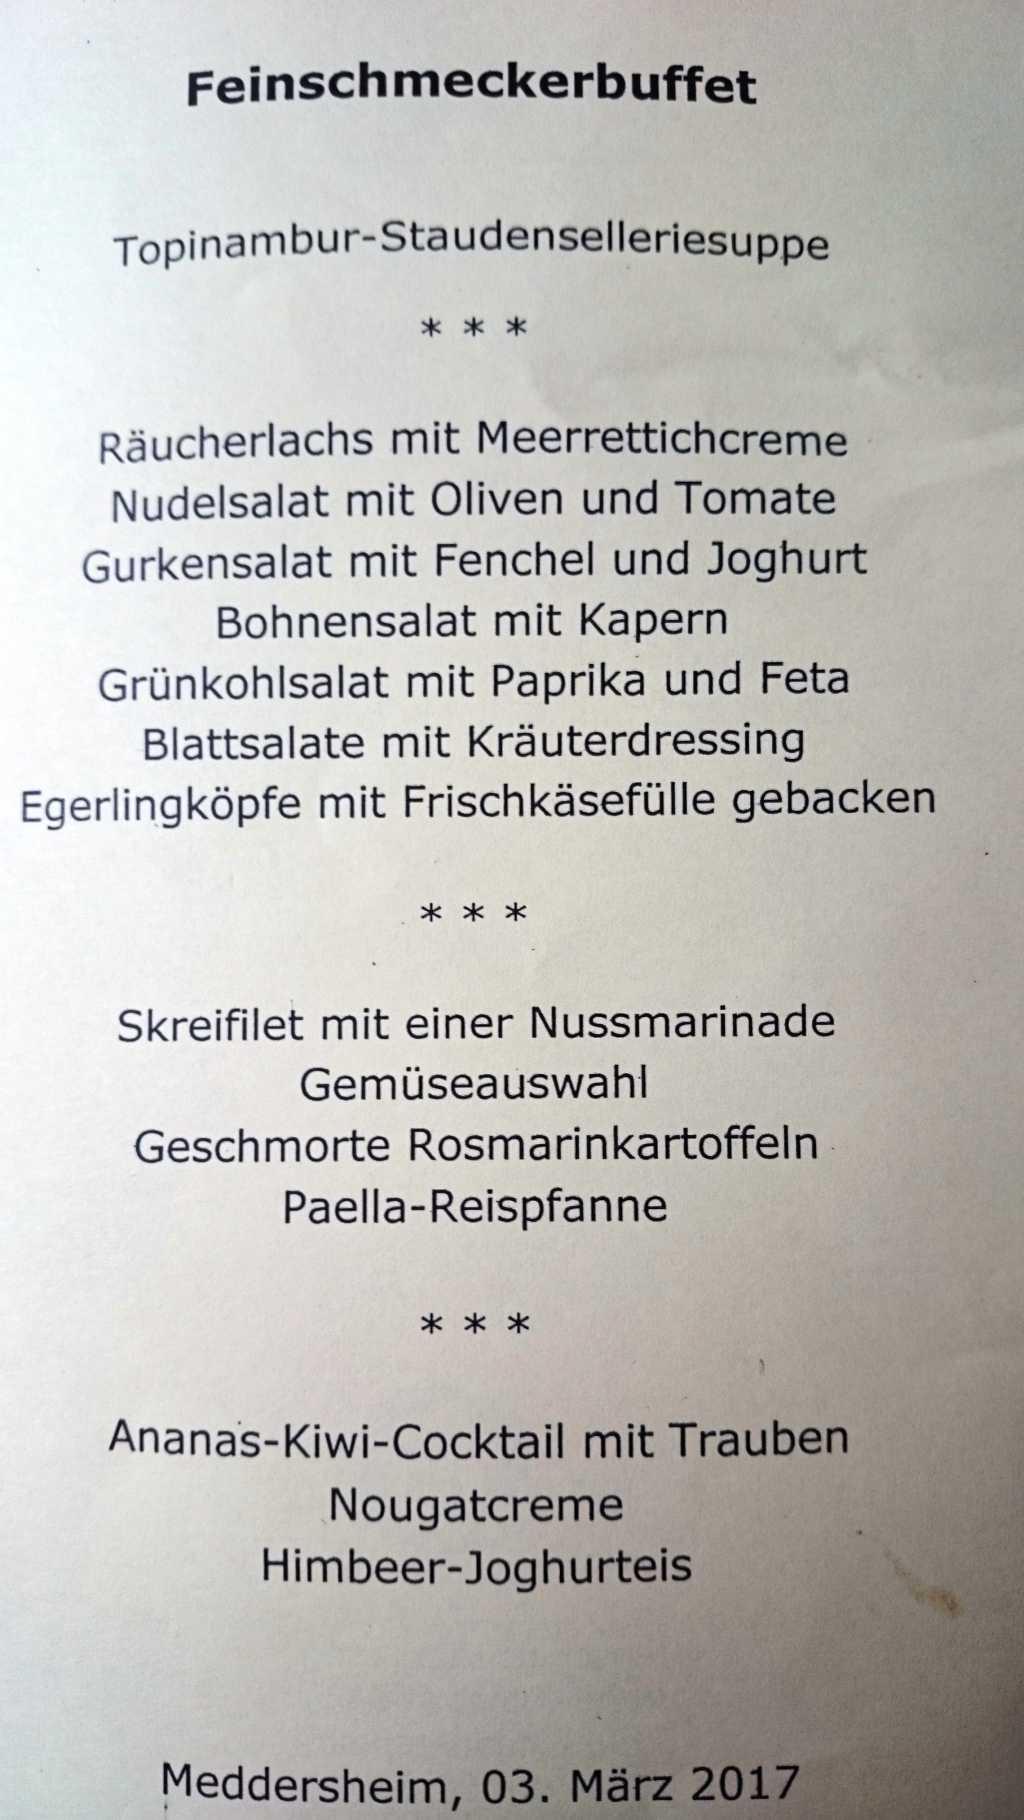 Vollwert-Buffet vom 03.03.17